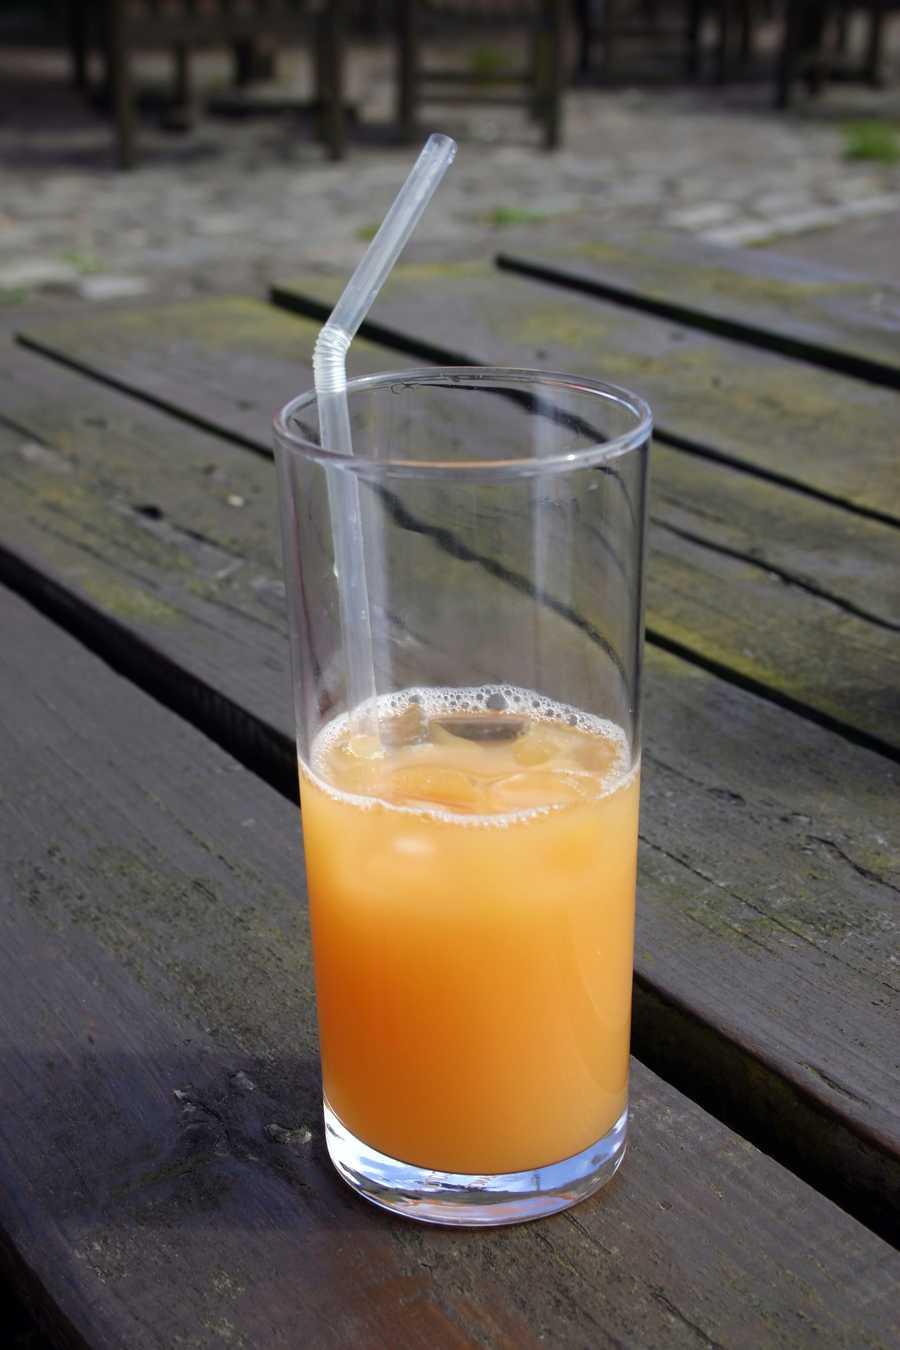 3. Fruit juices often have sugar added.